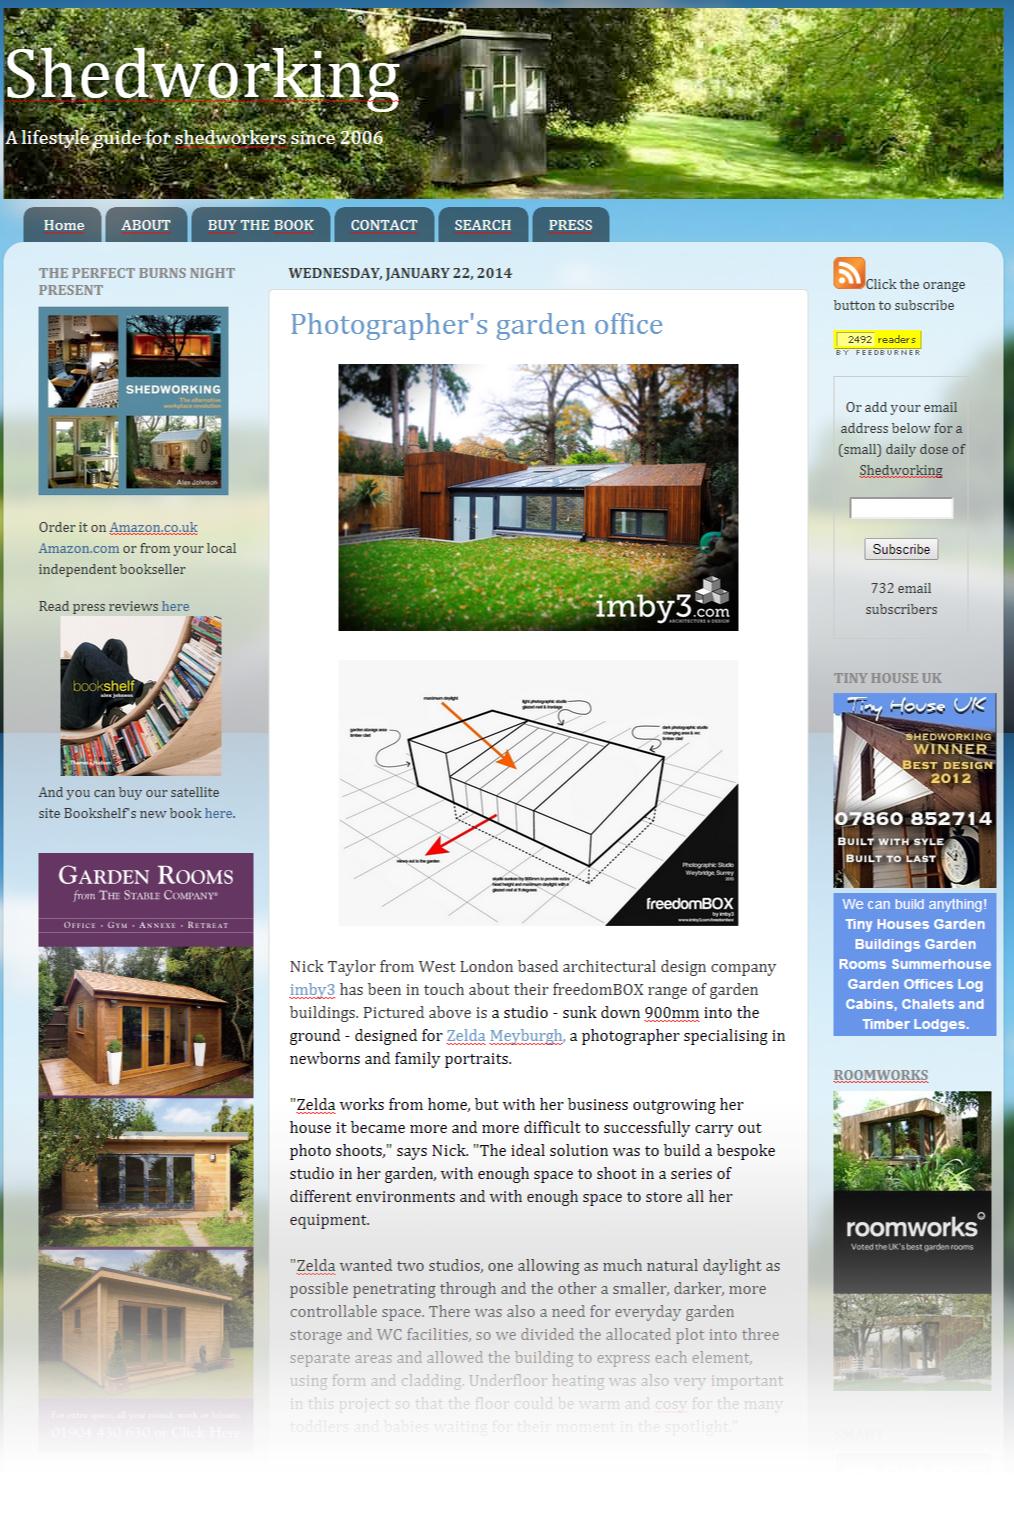 Shedworking-Photographer's-studio-architecture-design-imby3-weybridge-surrey.jpg